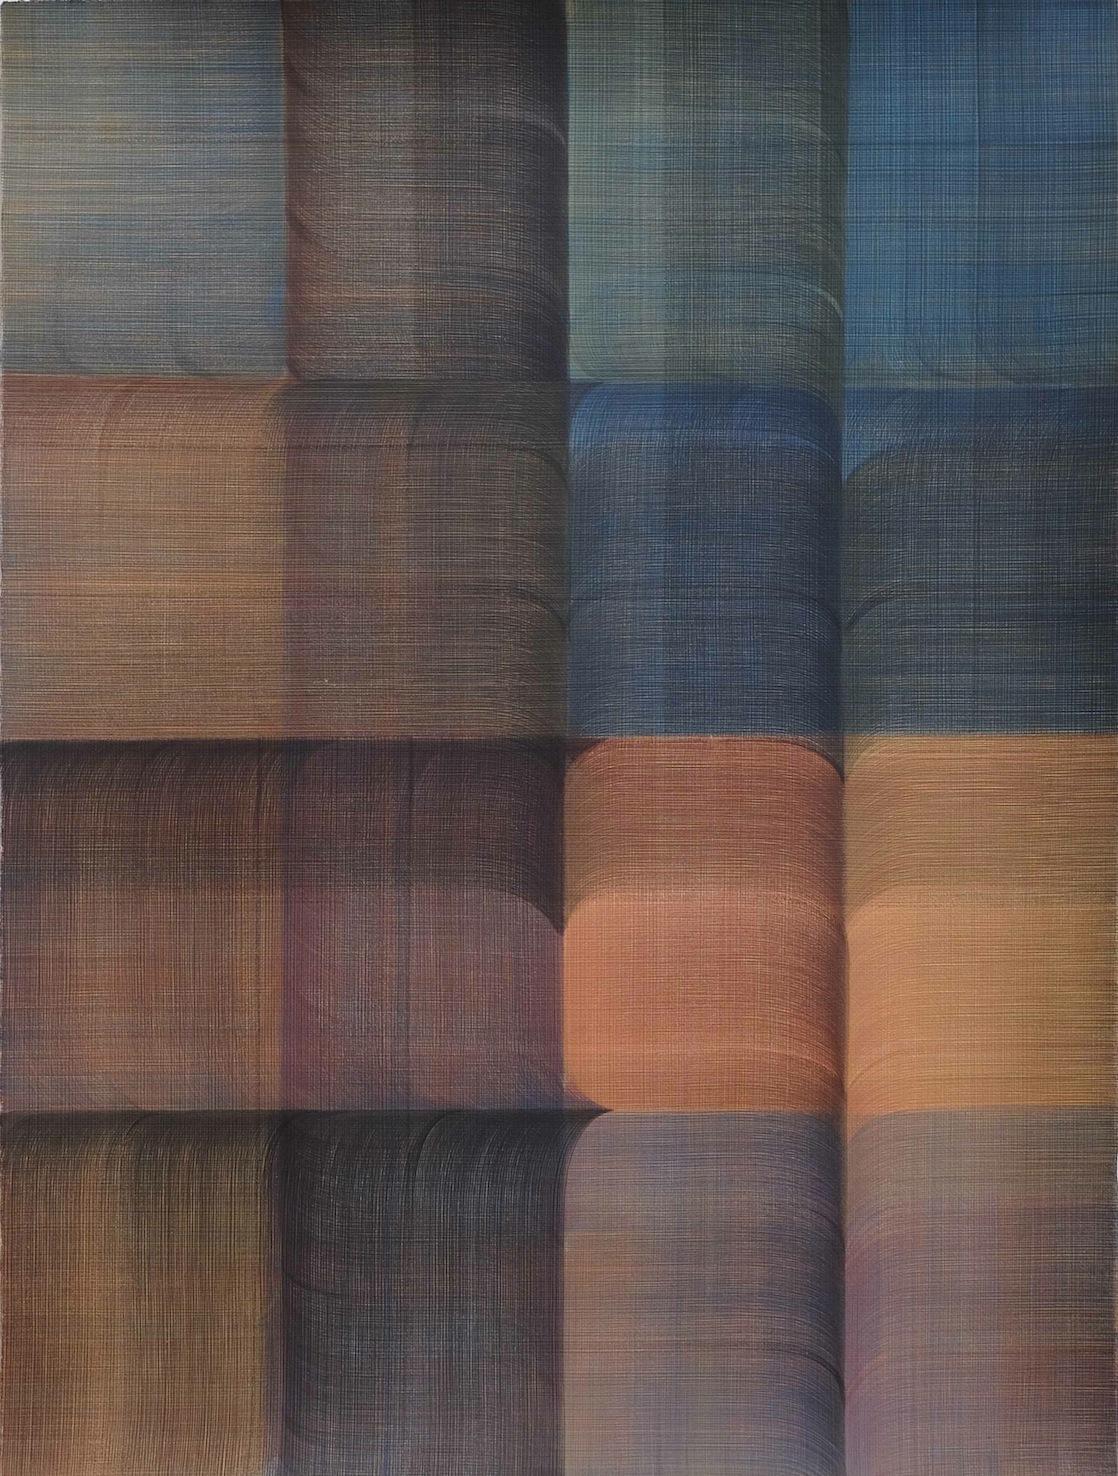 Untitled   Casein Paint on Paper  76 x 56 cm